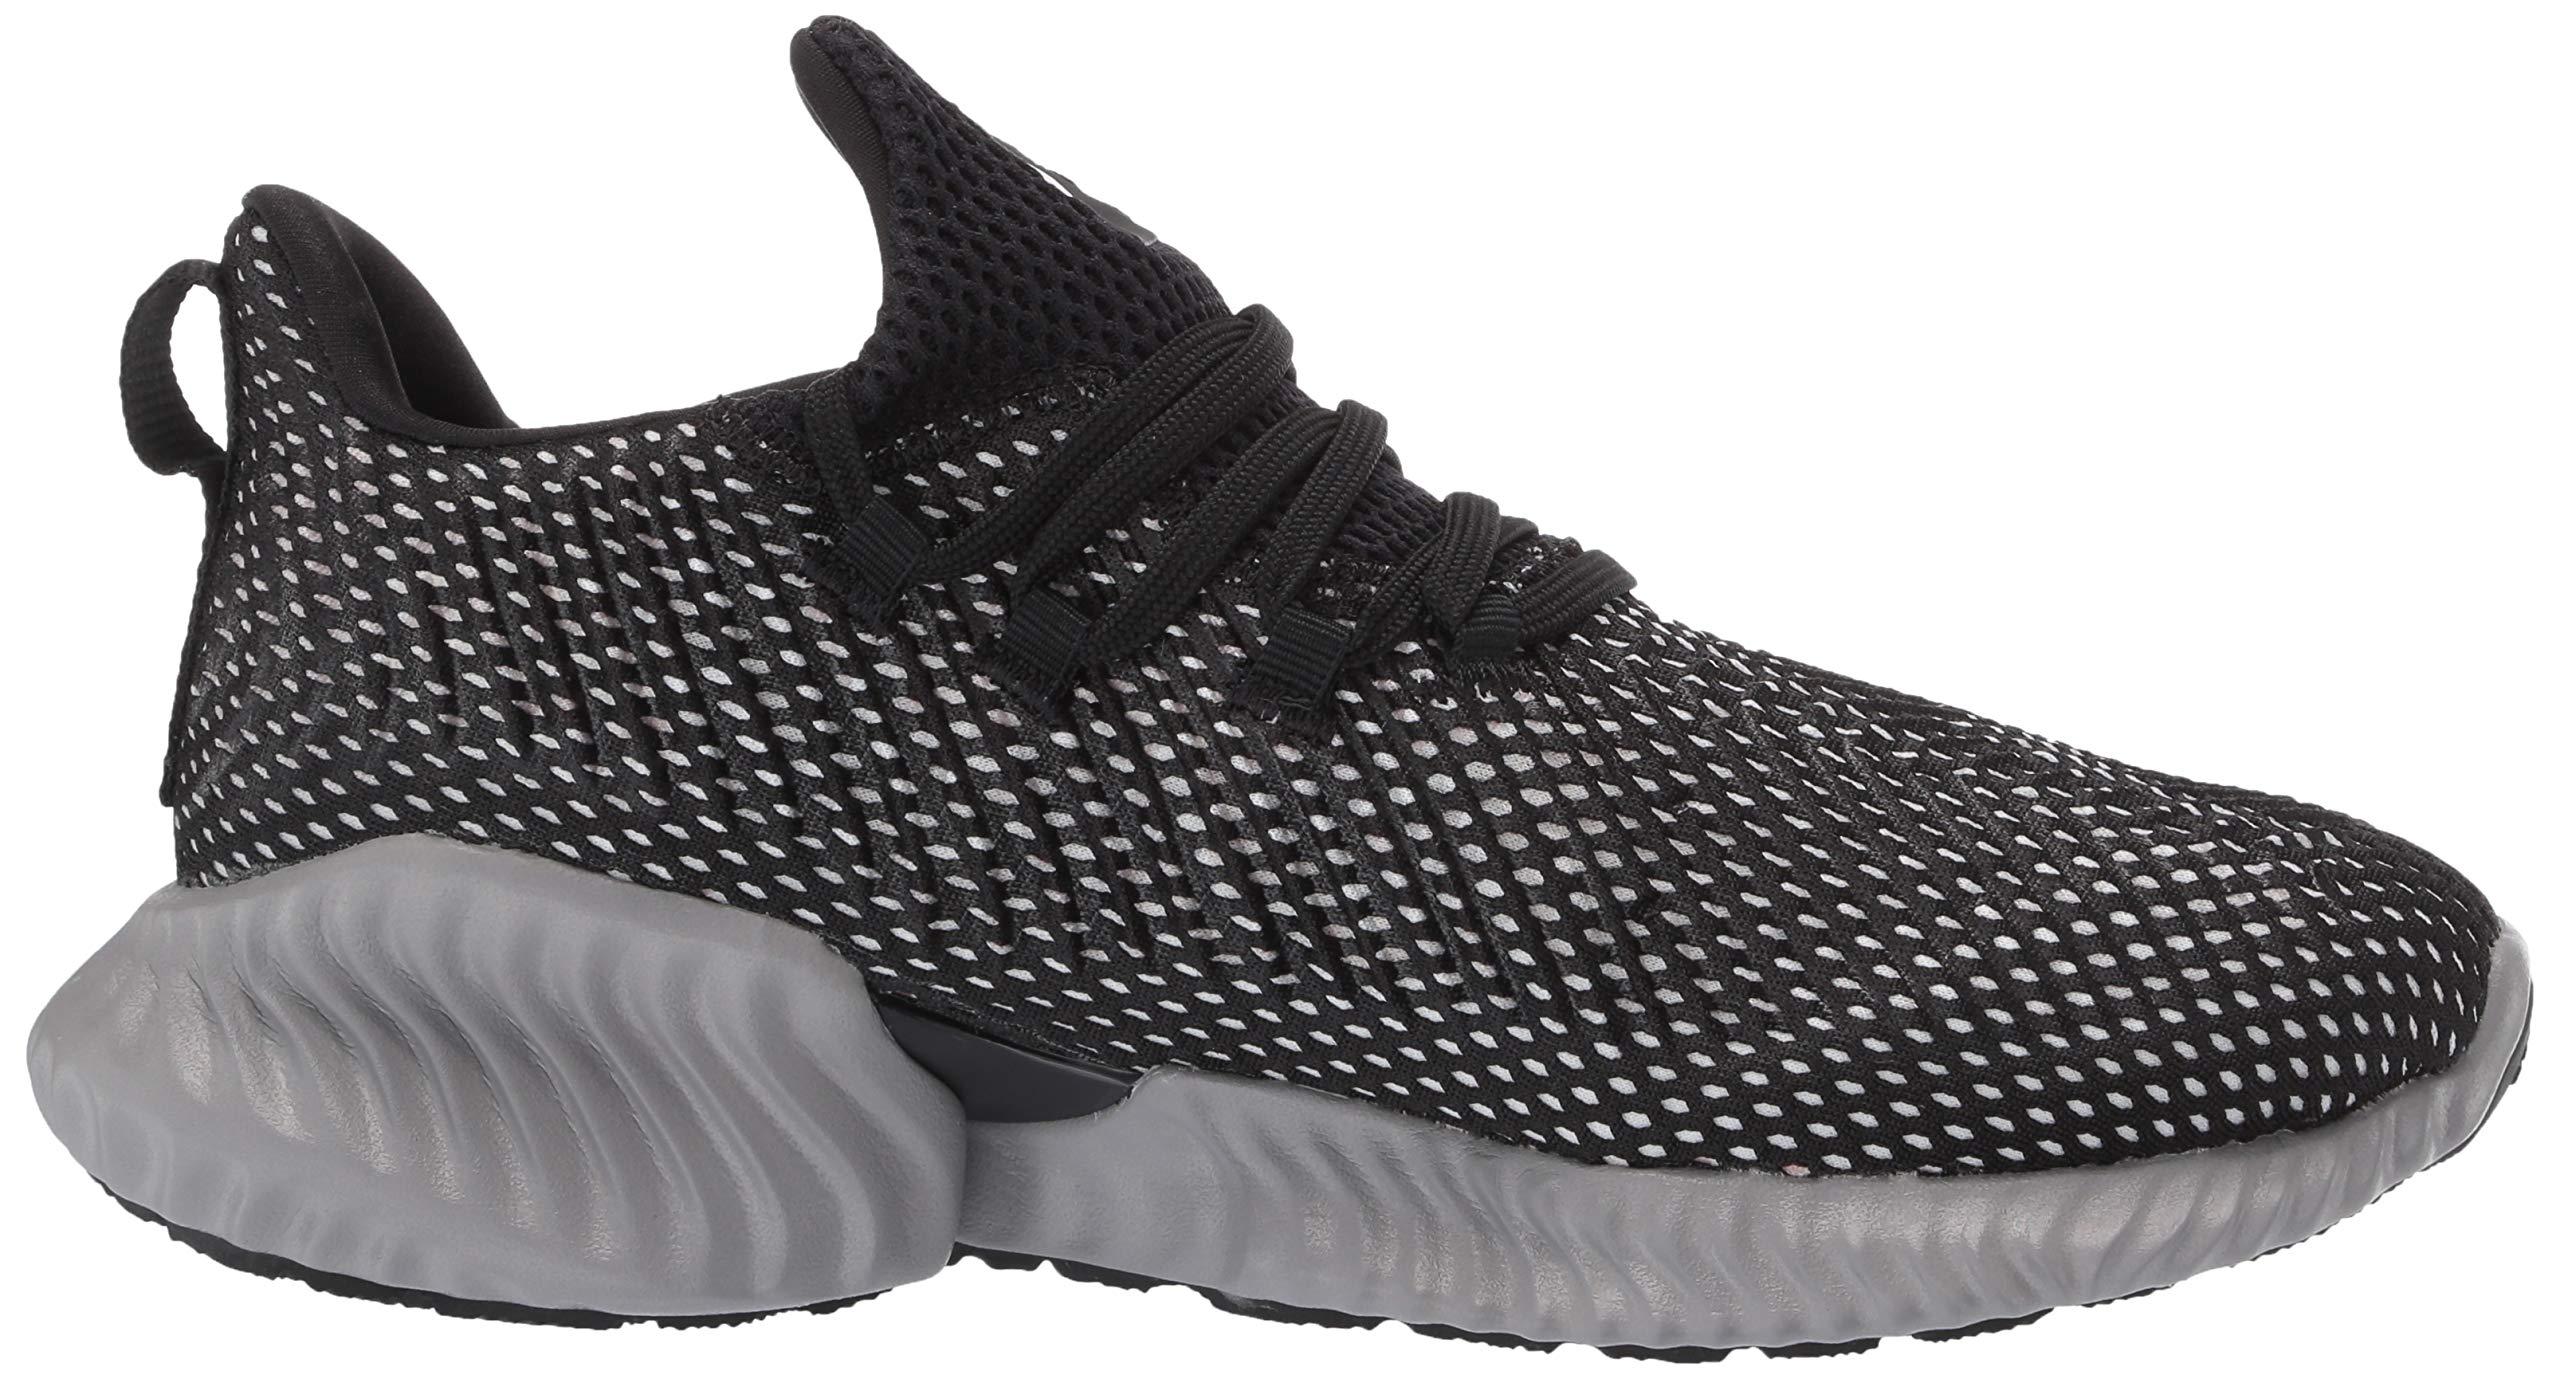 Adidas Kids Alphabounce Instinct, Black/White/Grey, 1 M US Little Kid by adidas (Image #7)